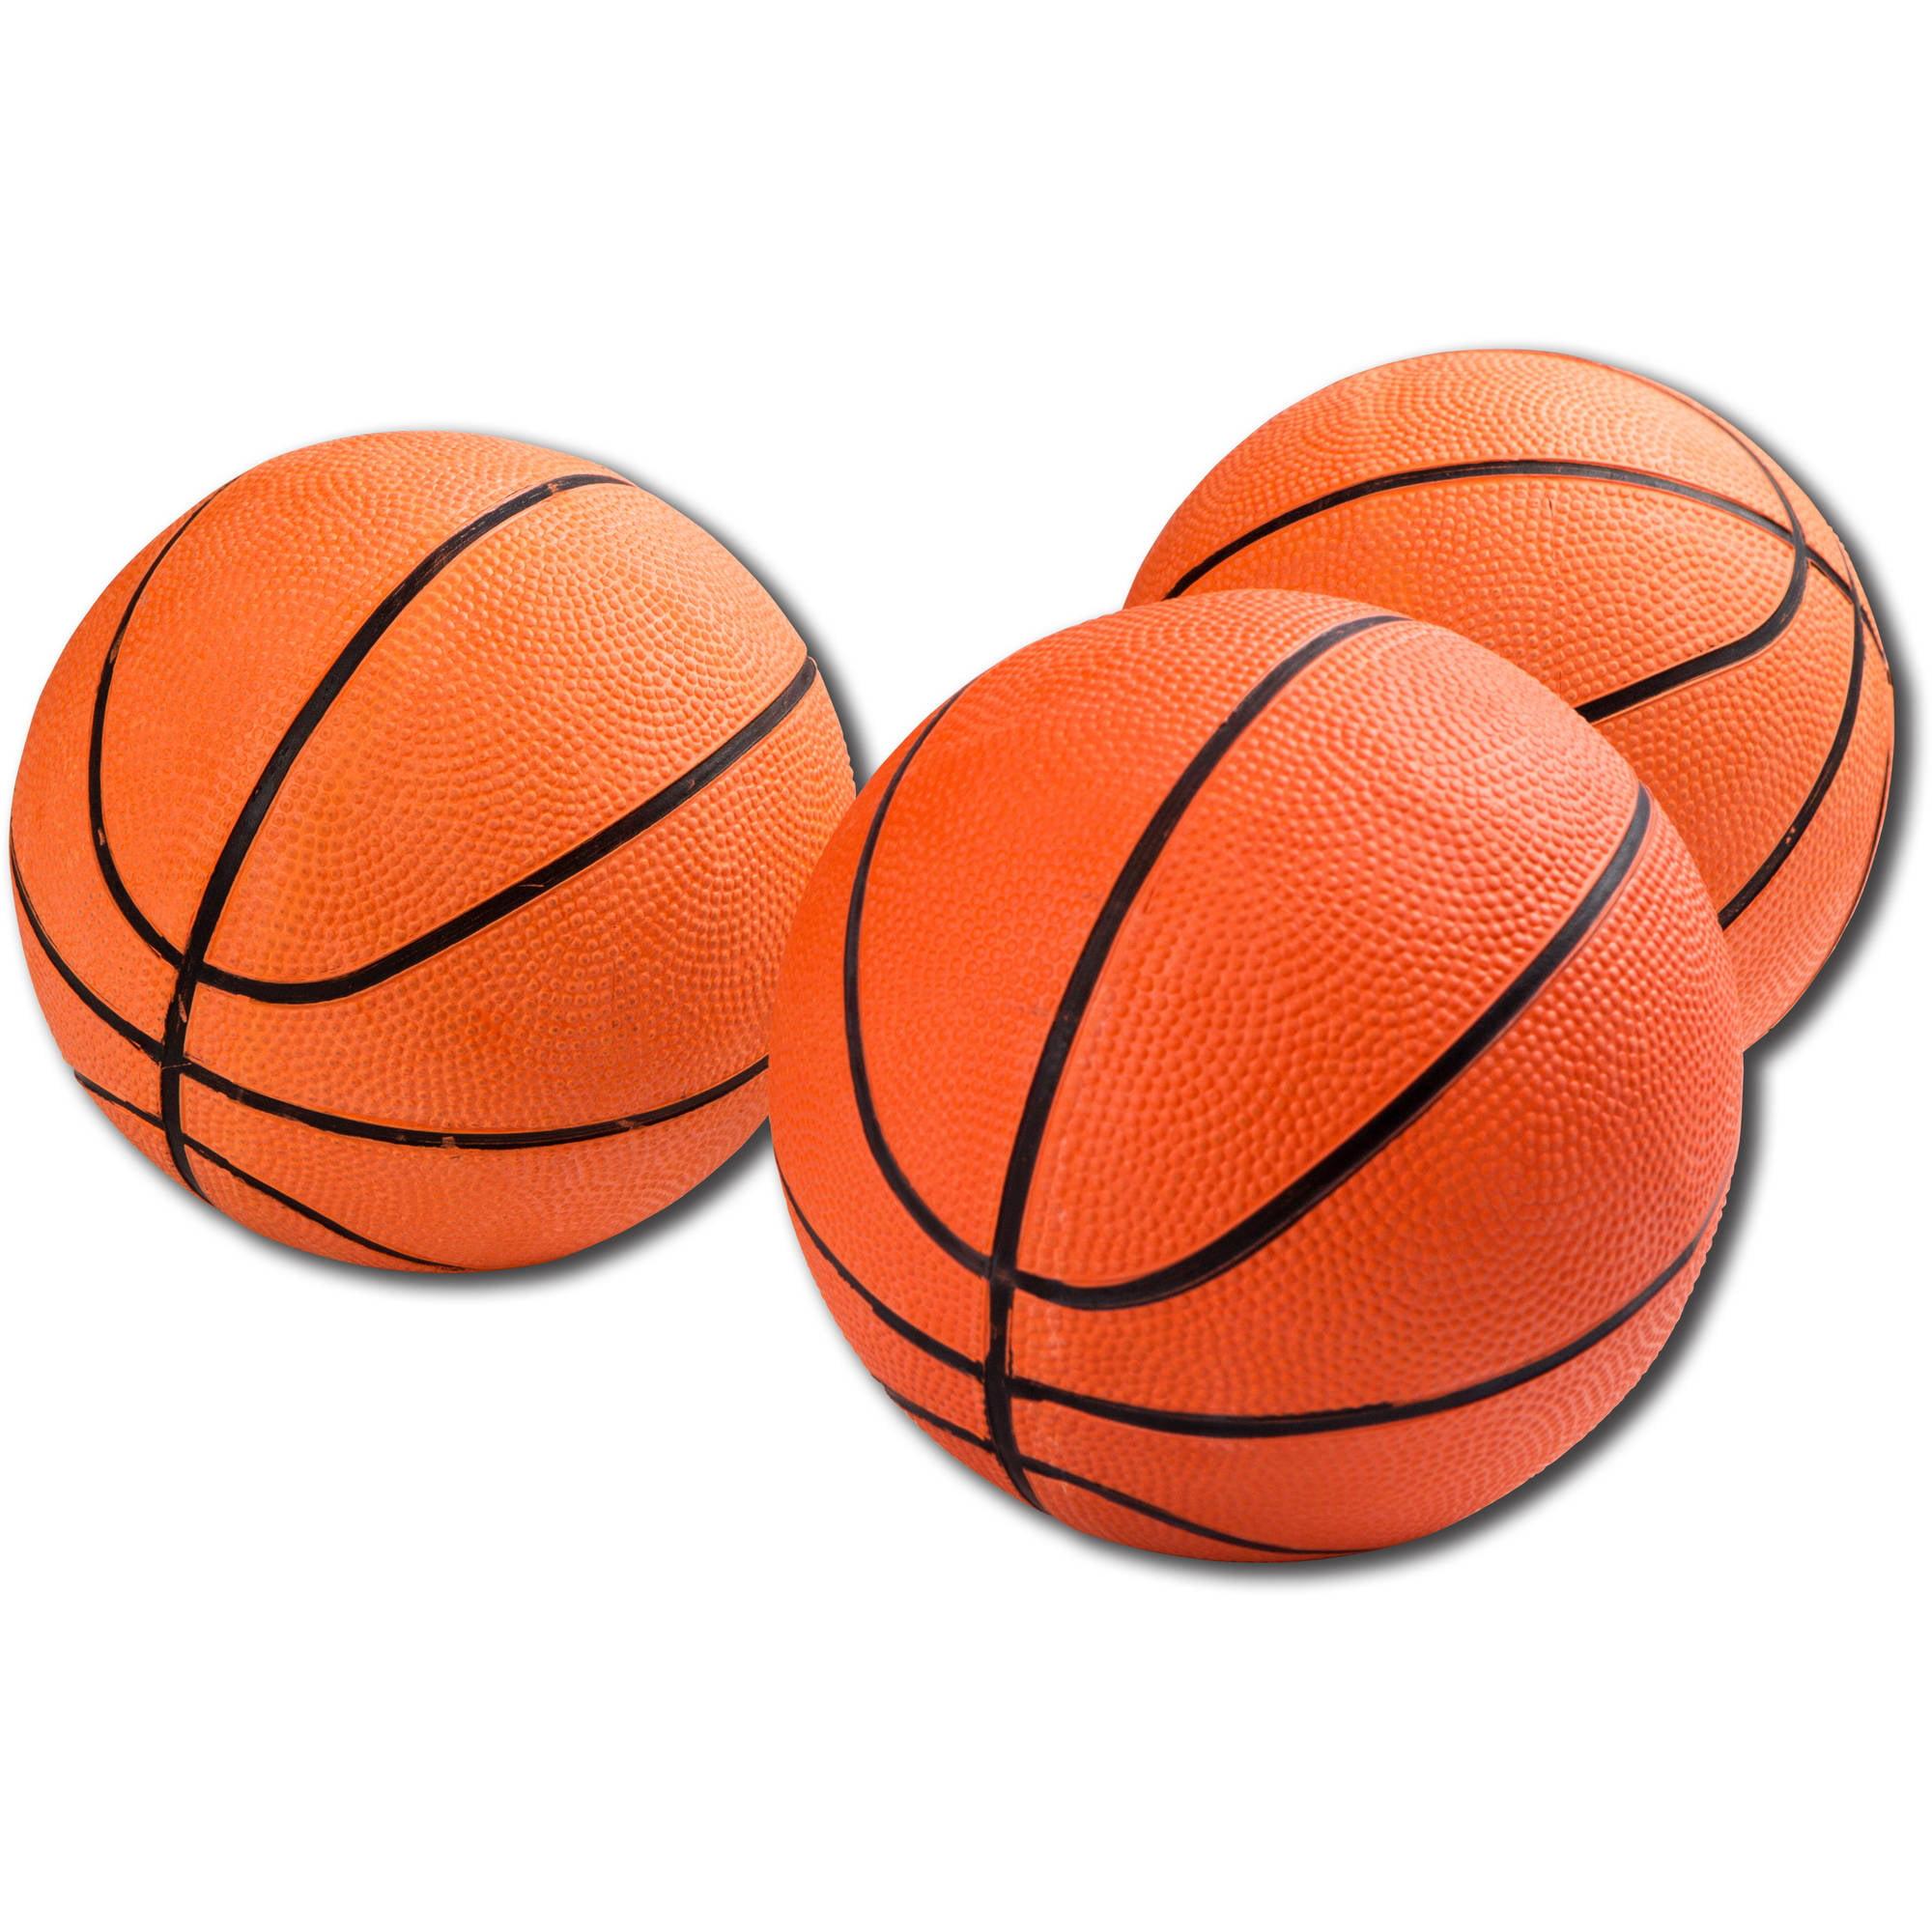 MD Sports Rubber Arcade Basketballs - Walmart.com